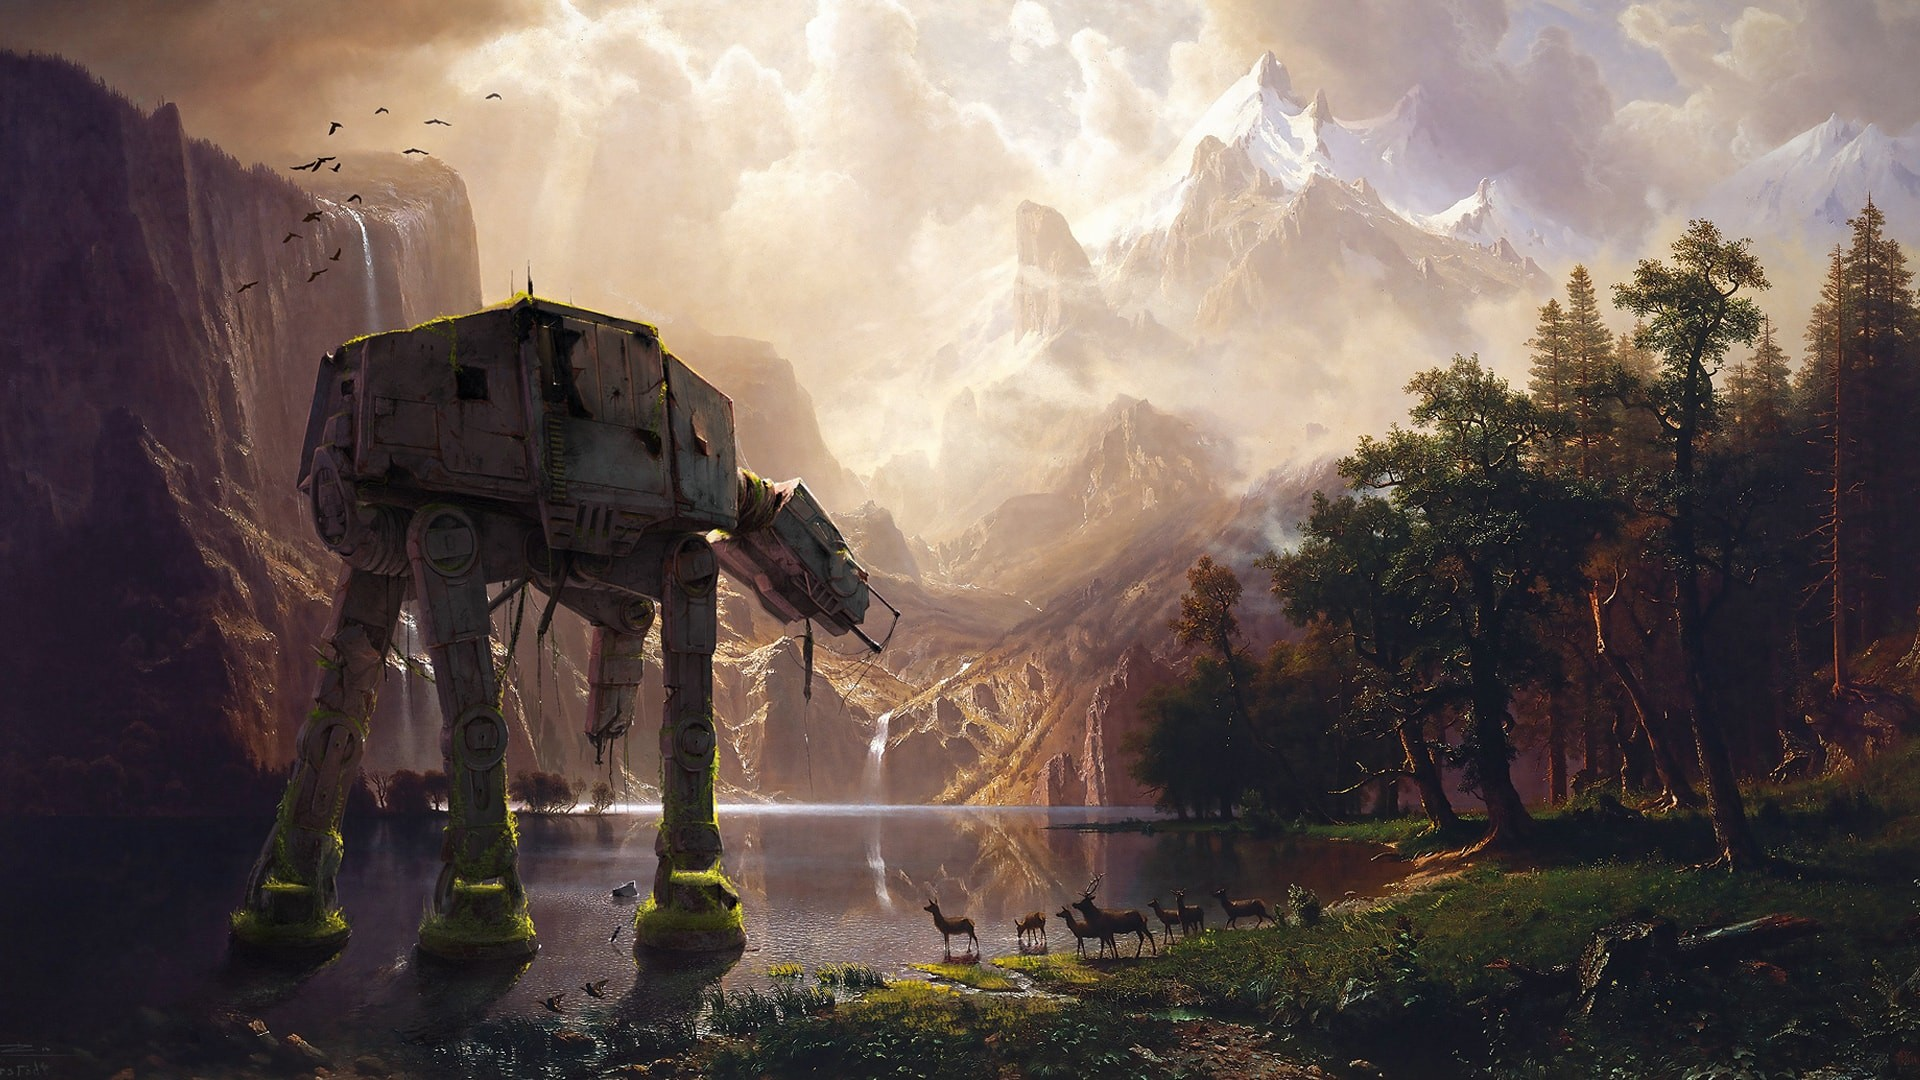 star wars giant robot concept art